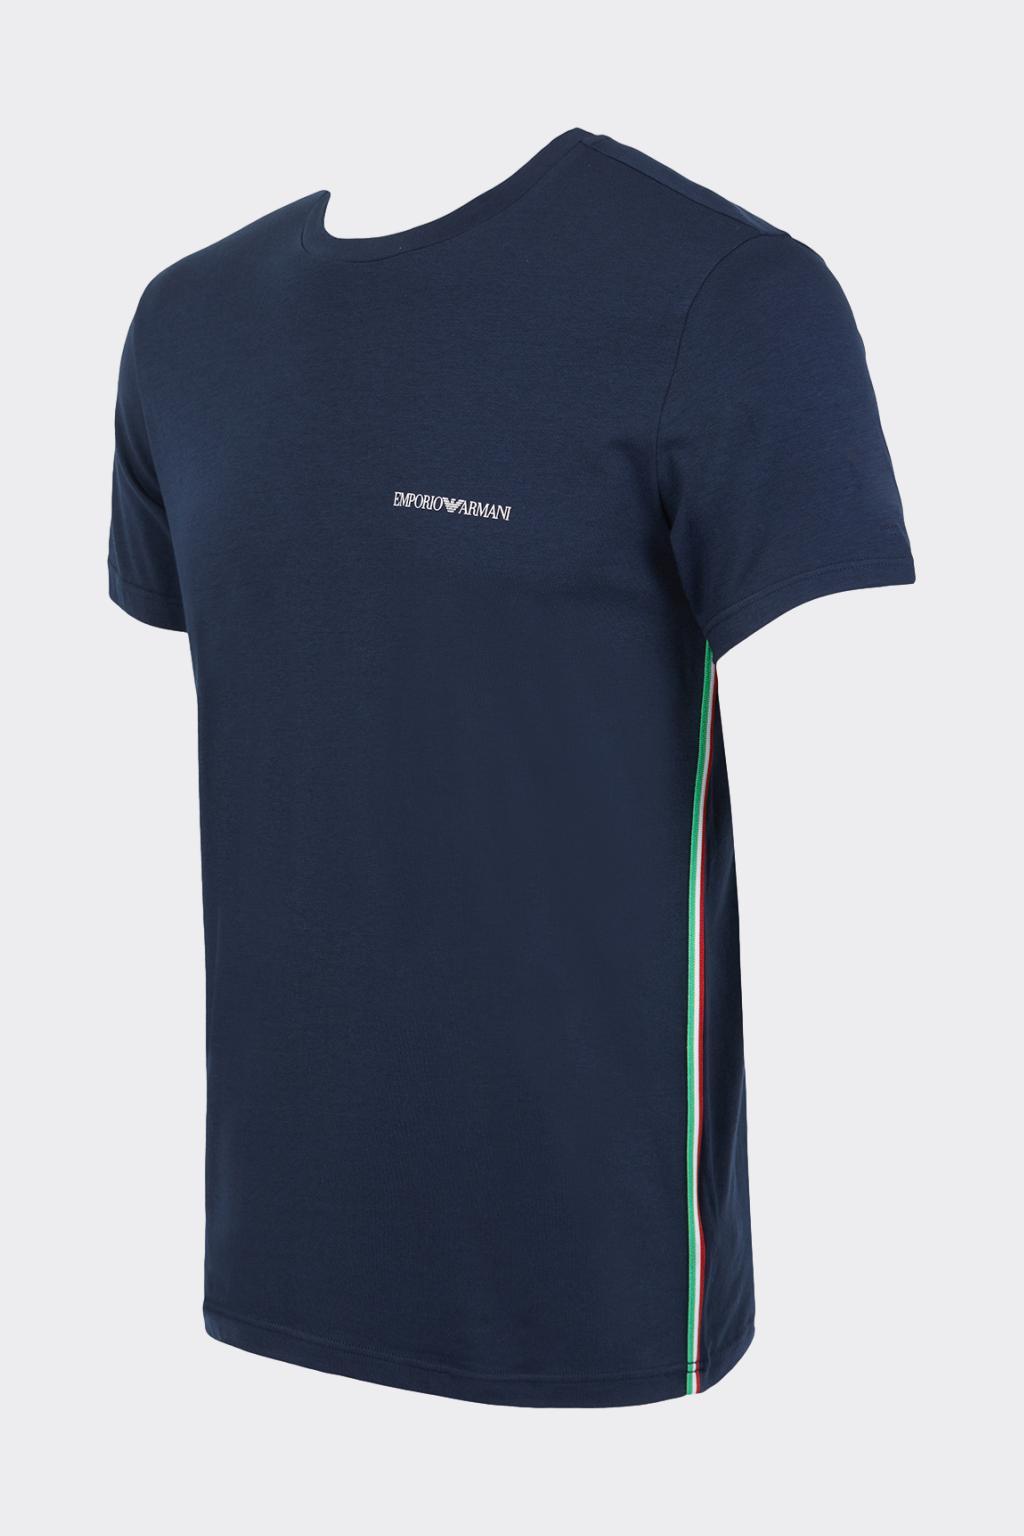 Emporio Armani Underwear Emporio Armani iconic tričko pánské - tmavě modré Velikost: L